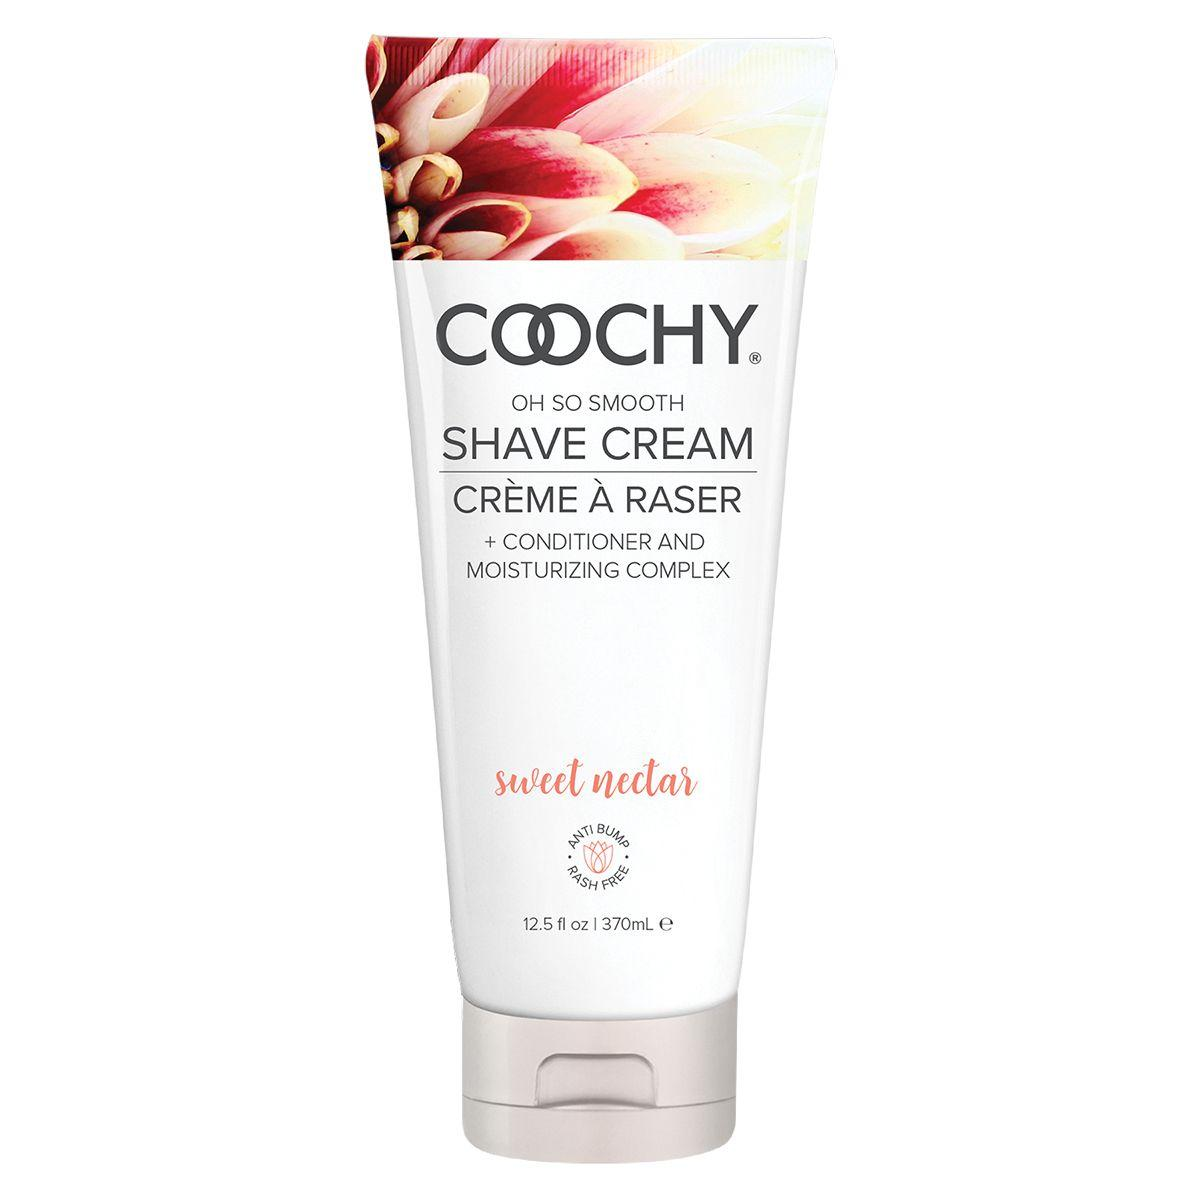 Увлажняющий комплекс COOCHY Sweet Nectar - 370 мл.-7576